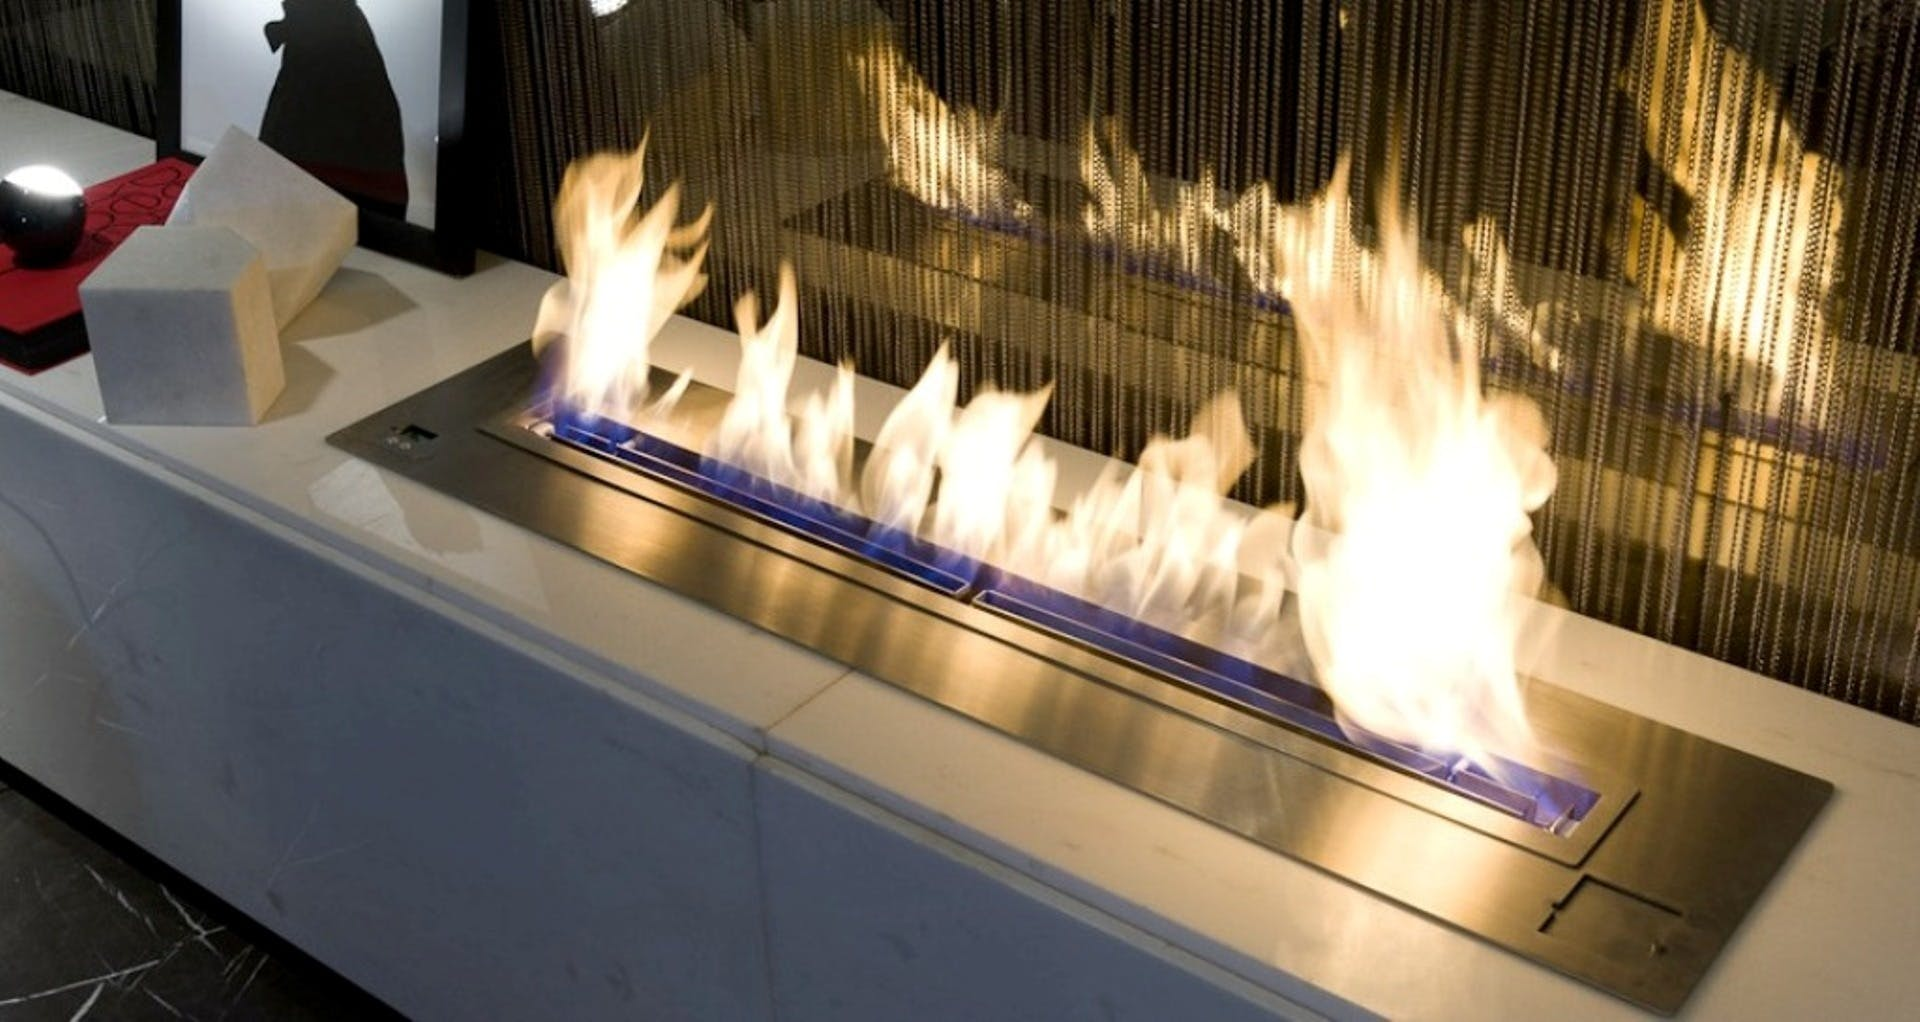 Fire on Gray Steel Frame